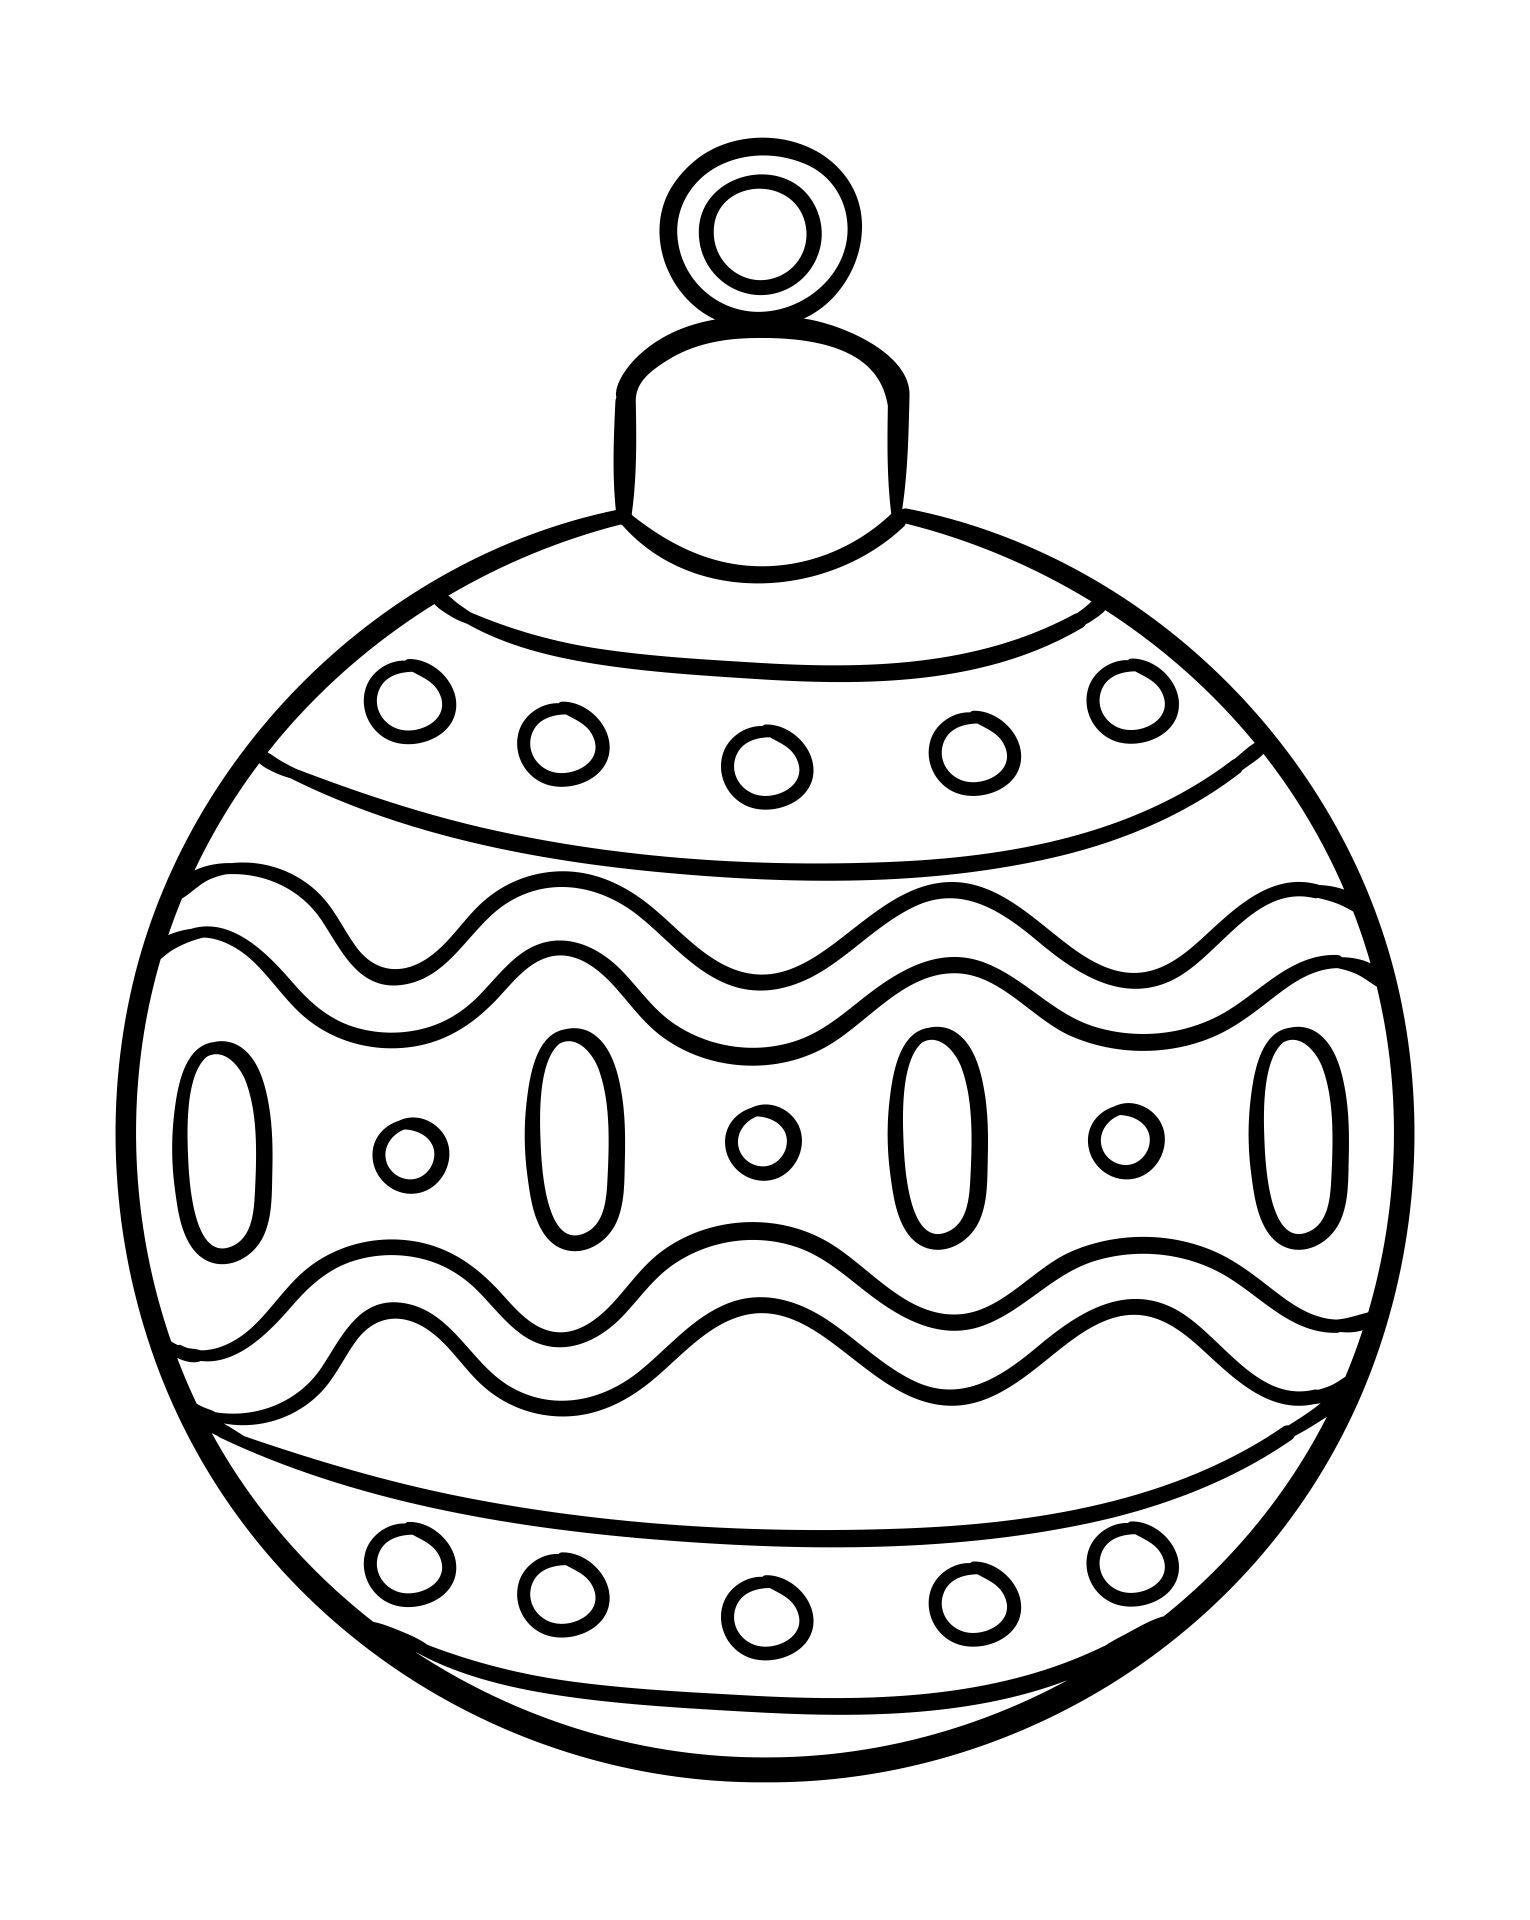 6 Best Printable Christmas Ornaments - Printablee.com